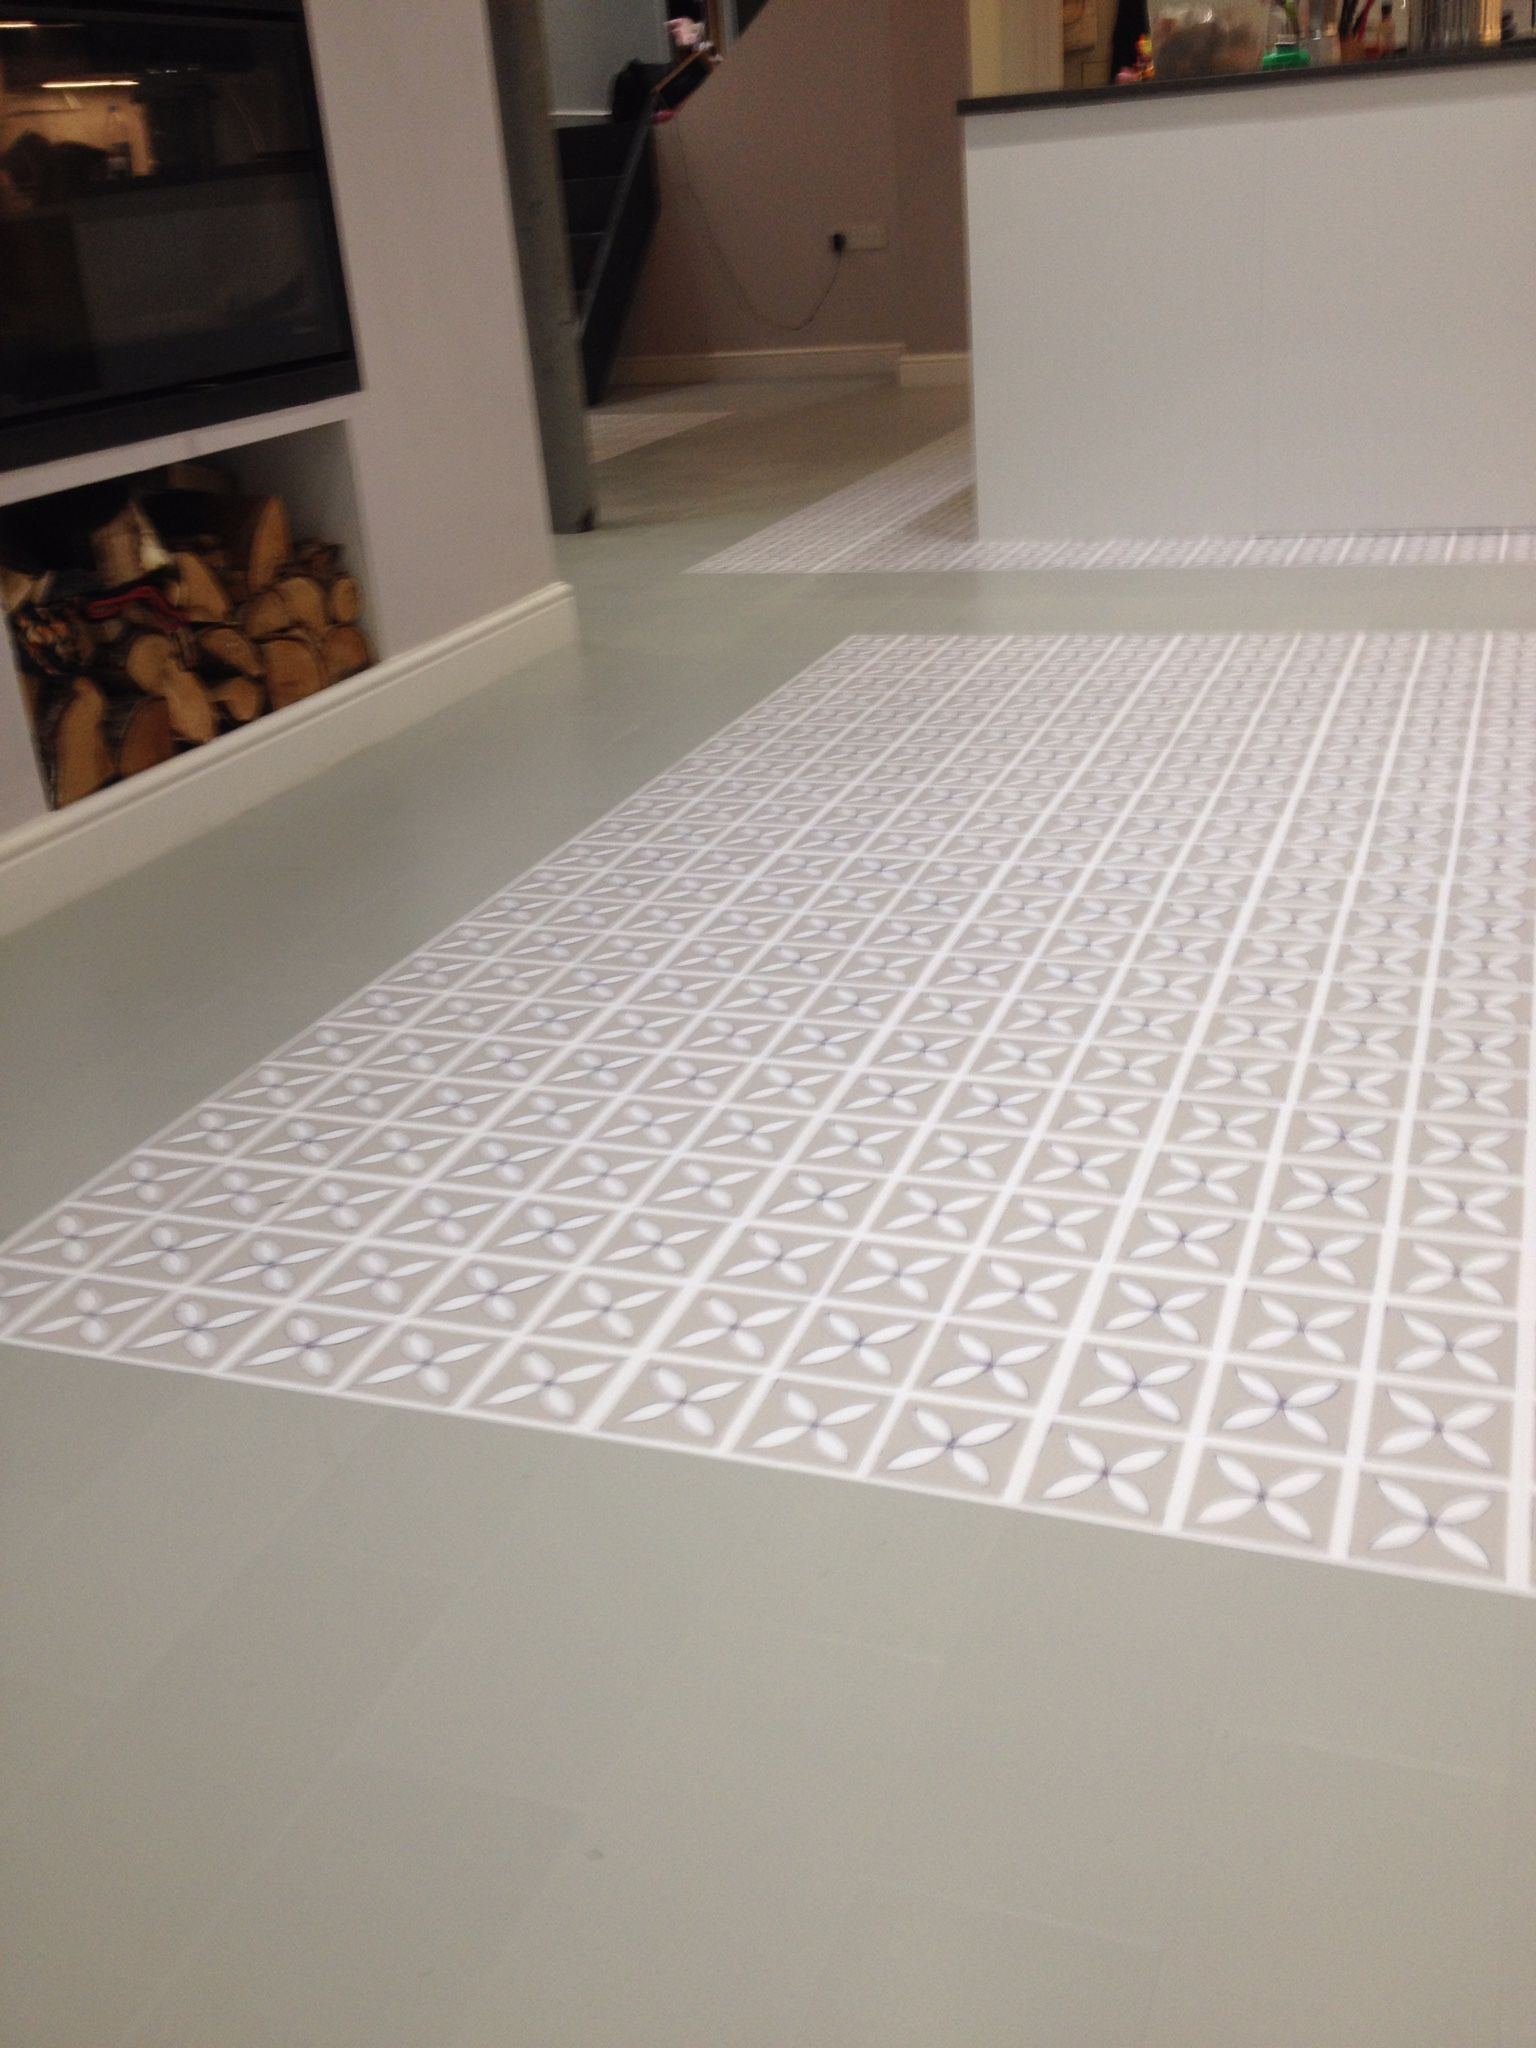 Luxury porcelain tile surface tiles luxury porcelain tiles in metal - Harvey Maria Dee Hardwicke Pebble Grey With A Steel Little Bricks Border Luxury Vinyl Tilevinyl Tilestile